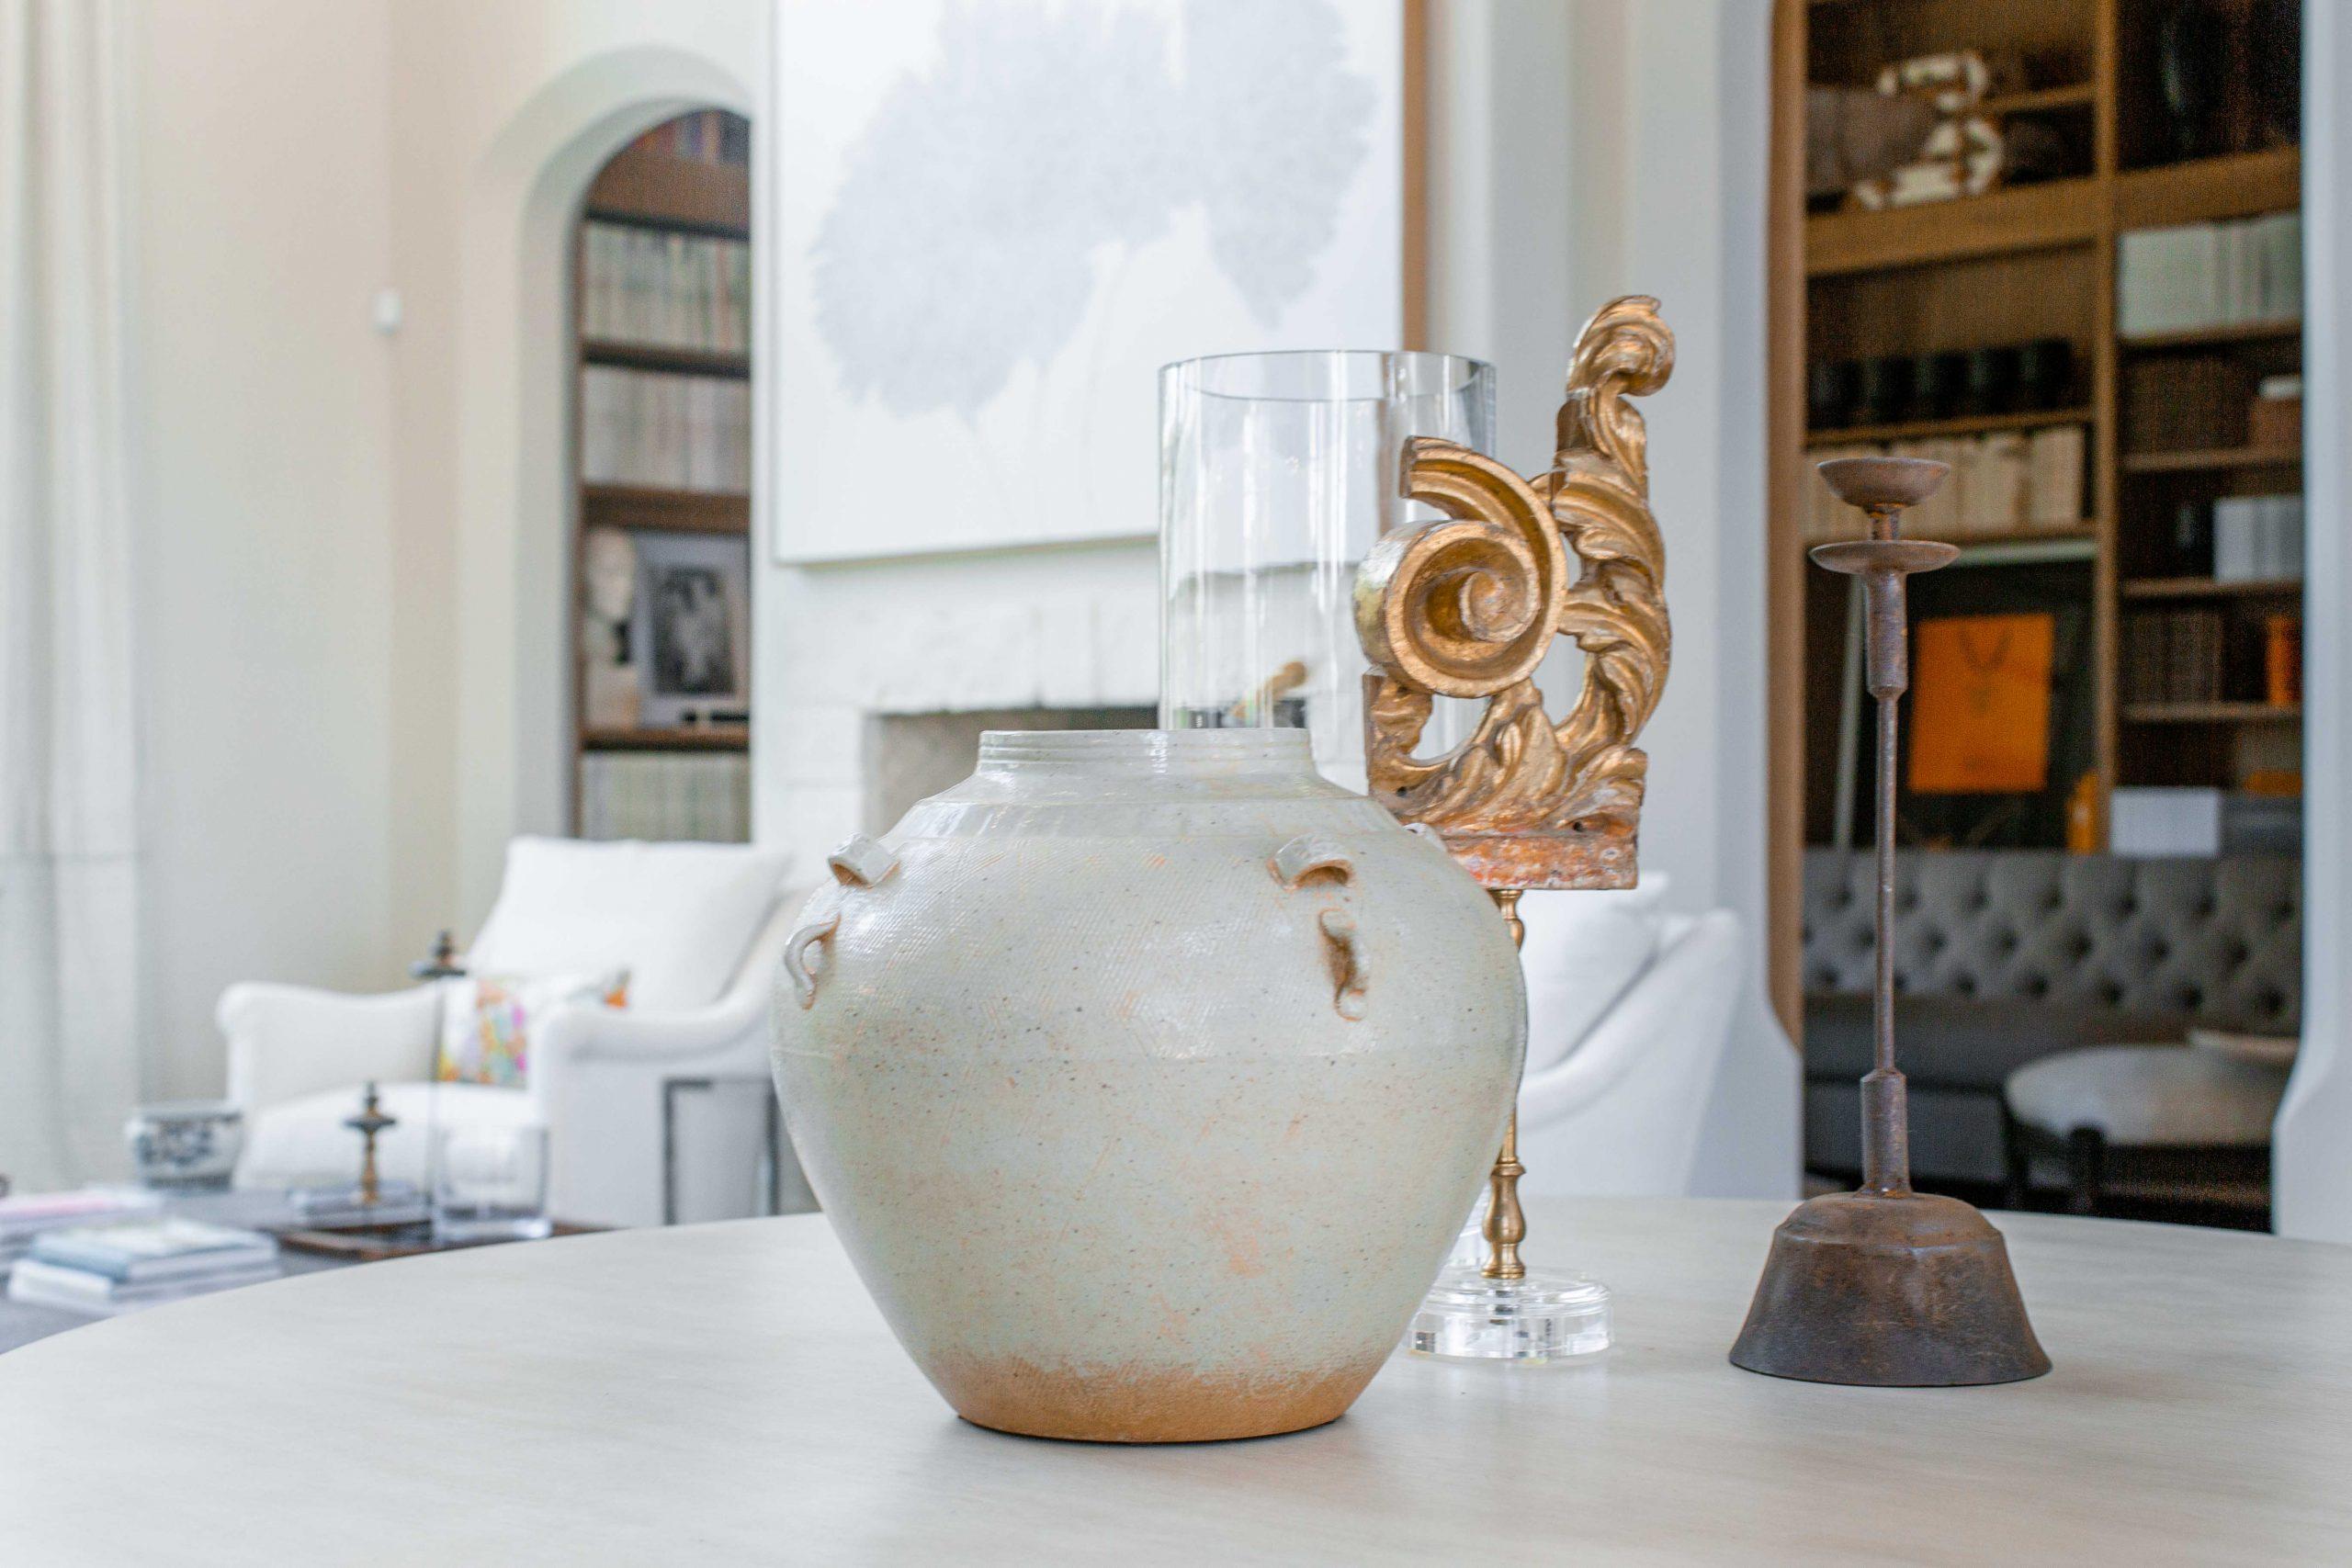 dixon-smith-interiors-baton-rouge-interior-design-custom-ivy-house-show-home-Web-0023